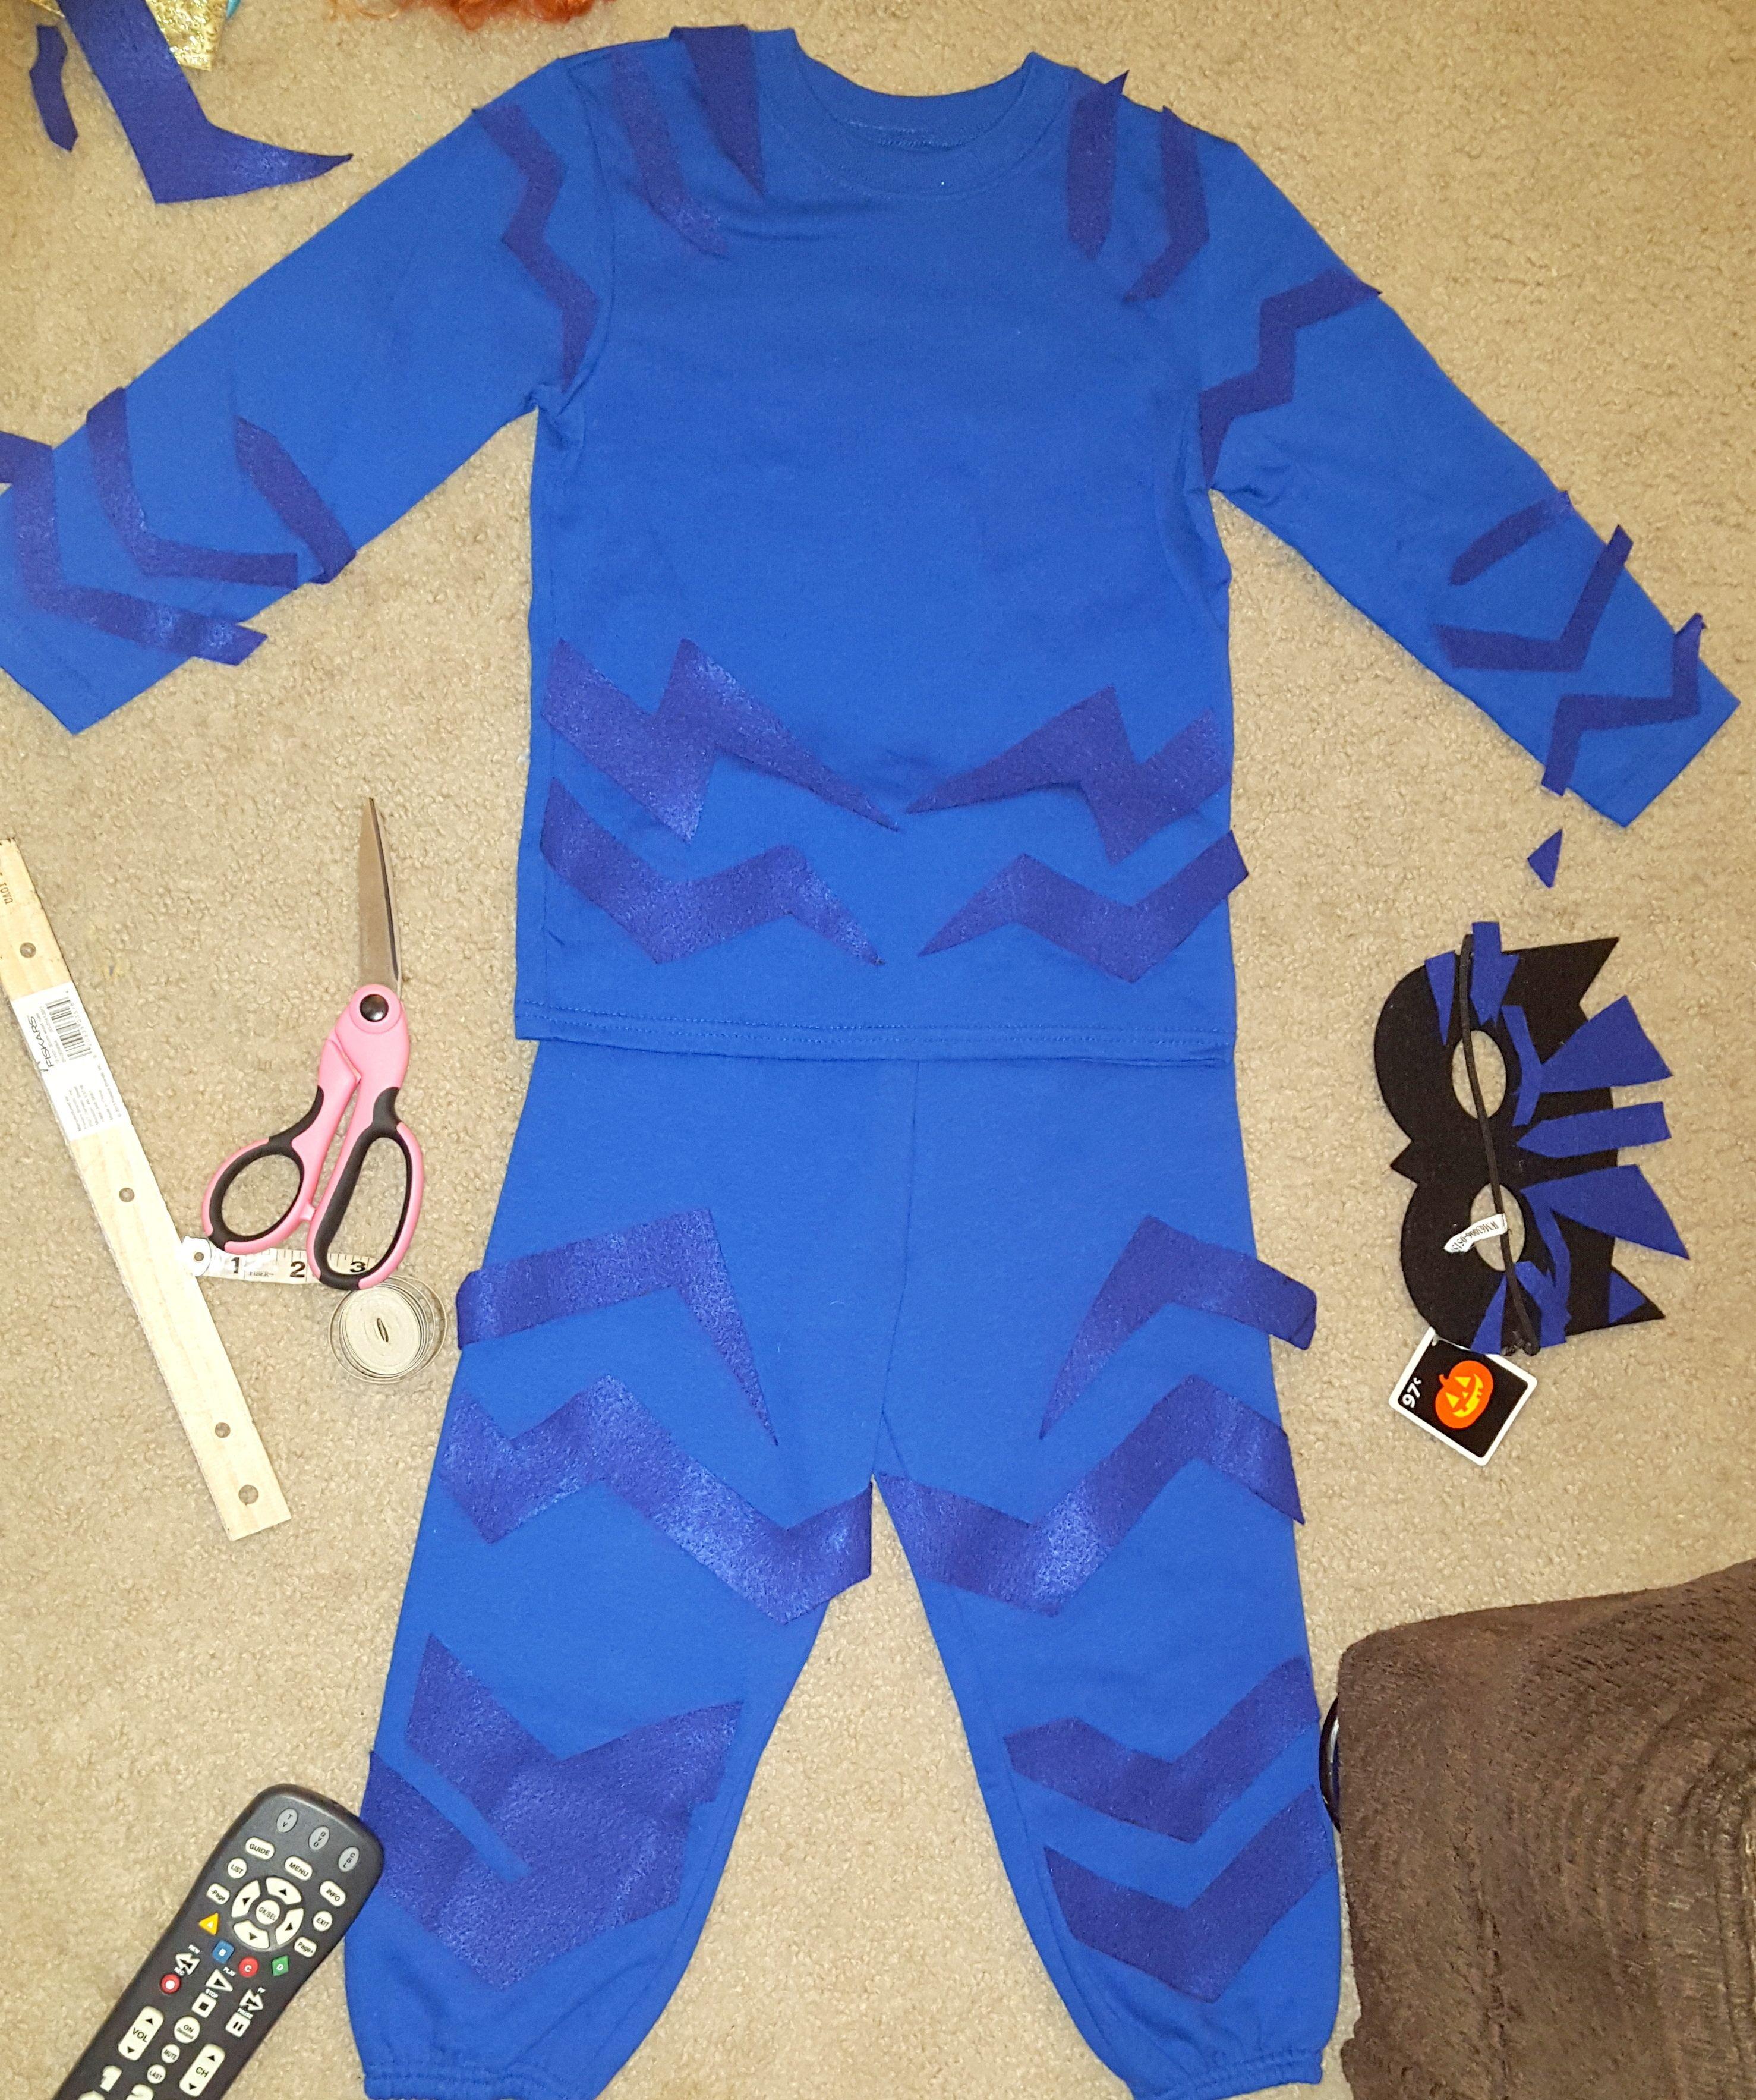 PJ masks catboy costume made with crafting felt | DIY PJ ...